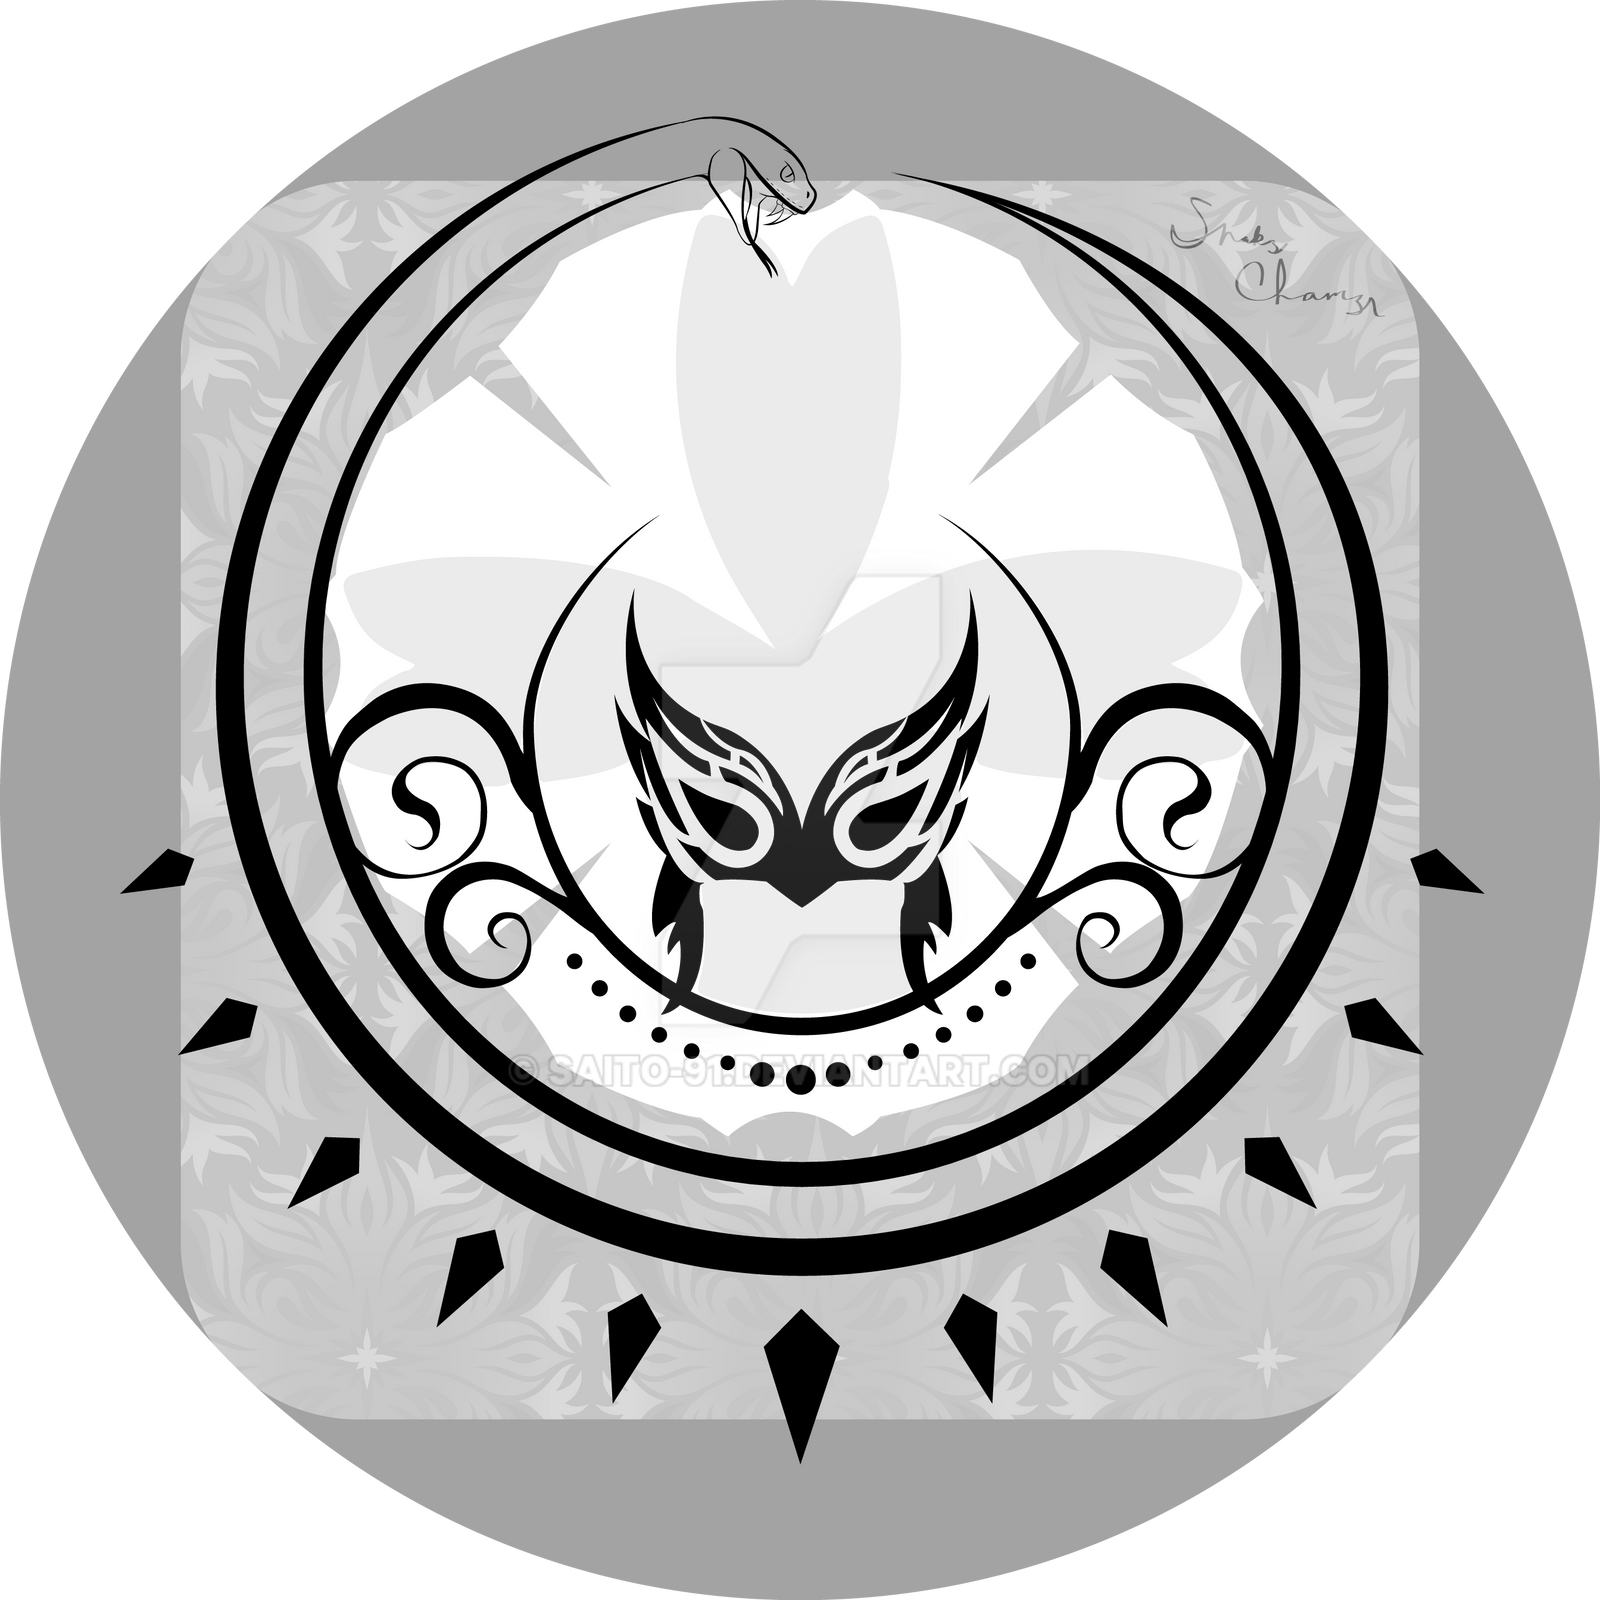 Snak3-Charm3r's Profile Picture